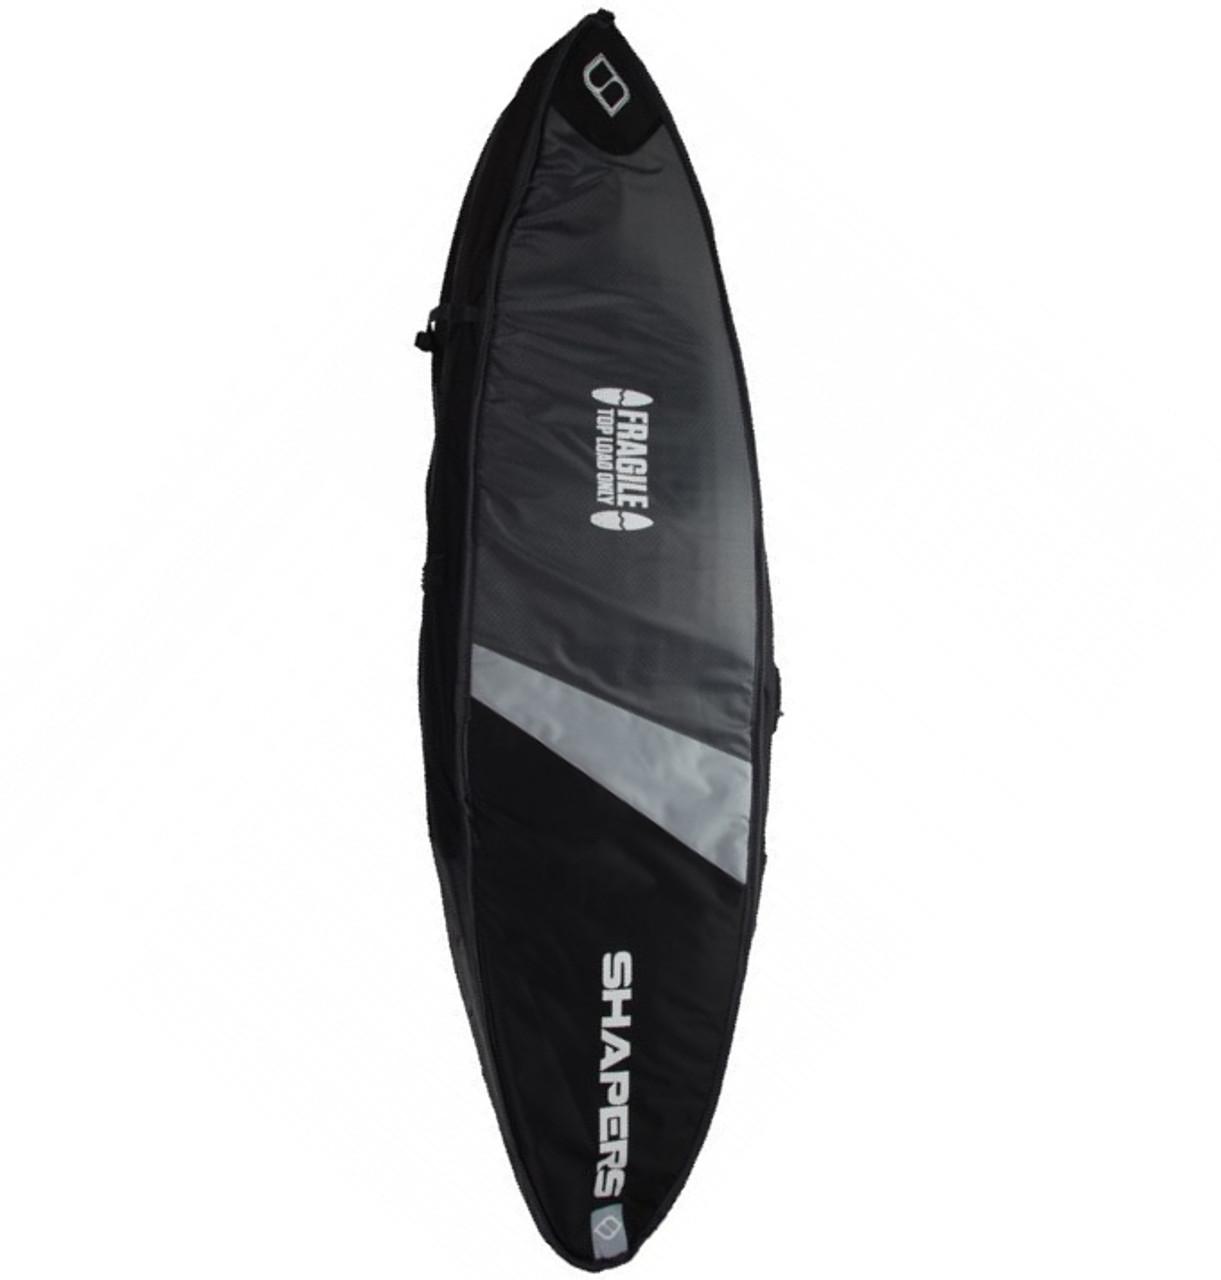 shapers team surfboard bag